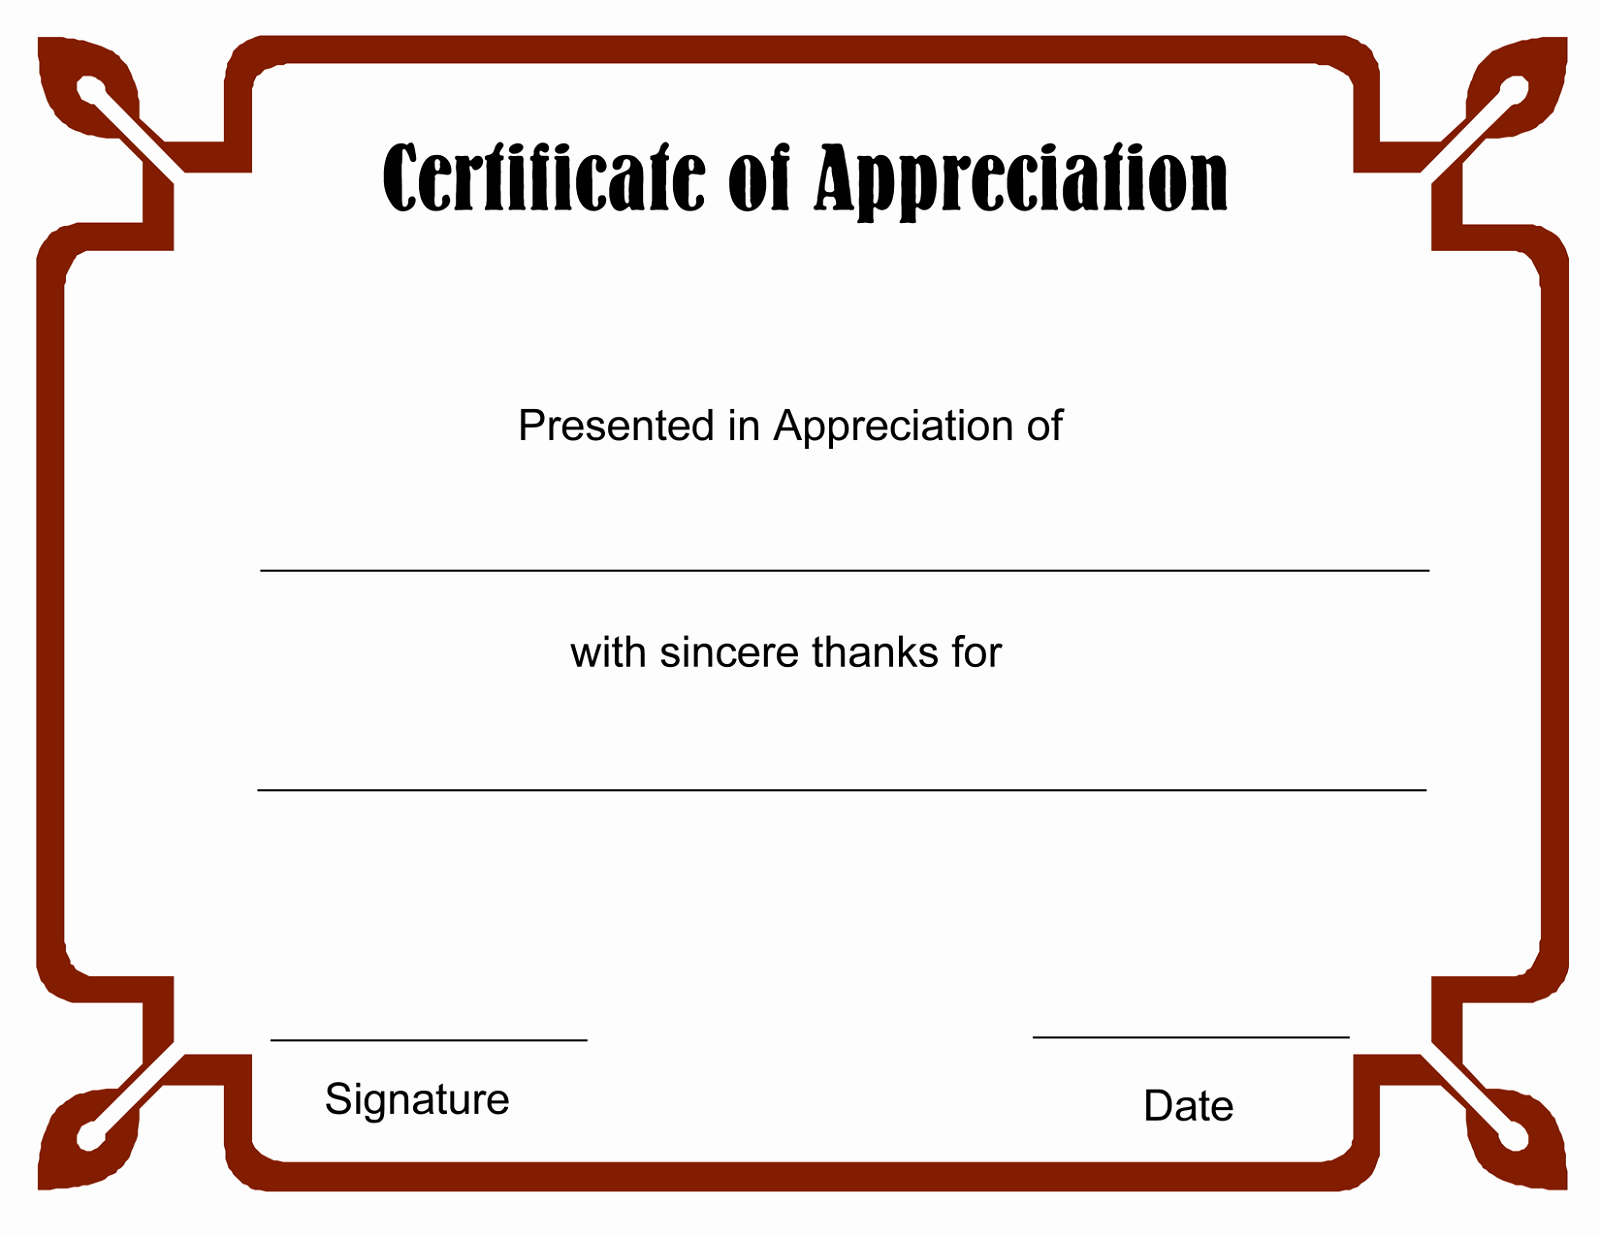 Blank Certificate Templates for Word Elegant Blank Certificate Templates to Print